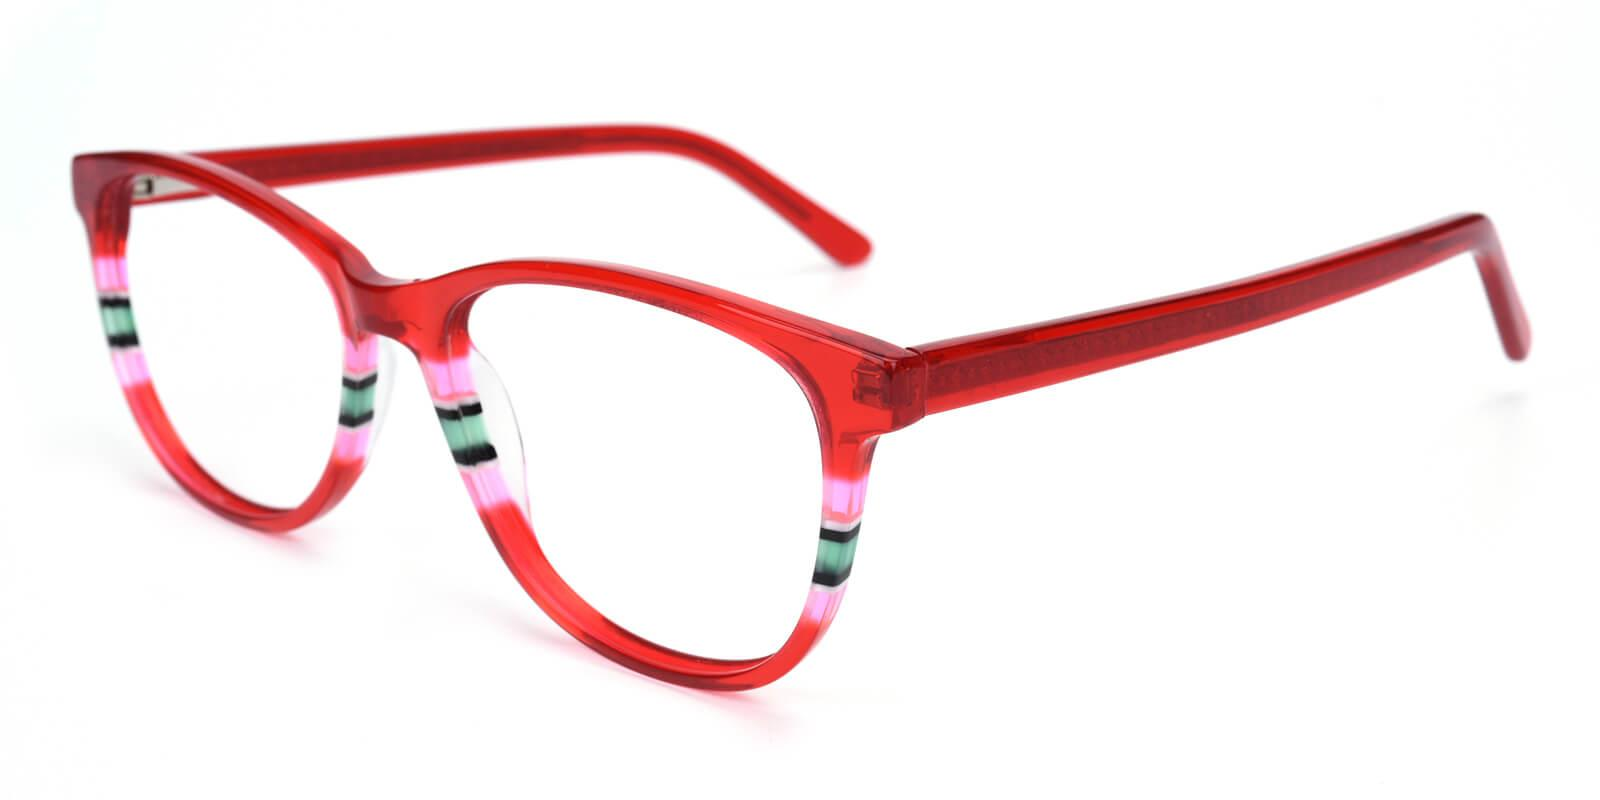 Faithely-Red-Square / Cat-Acetate-Eyeglasses-detail